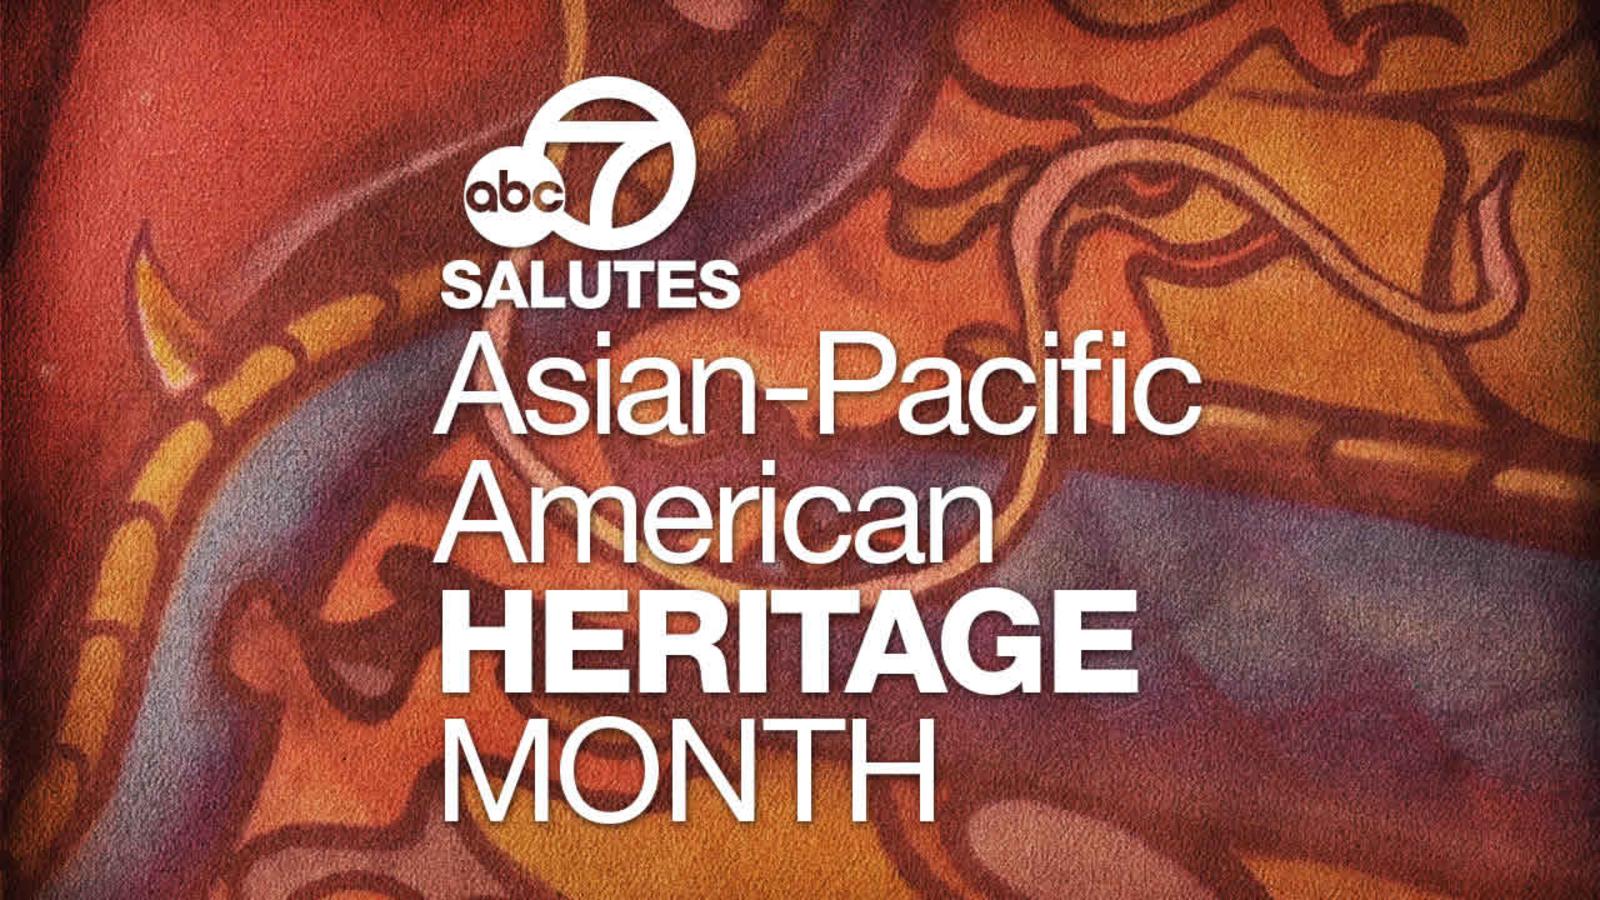 abc7news.com: ABC7 celebrates Asian-Pacific American Heritage Month 2015